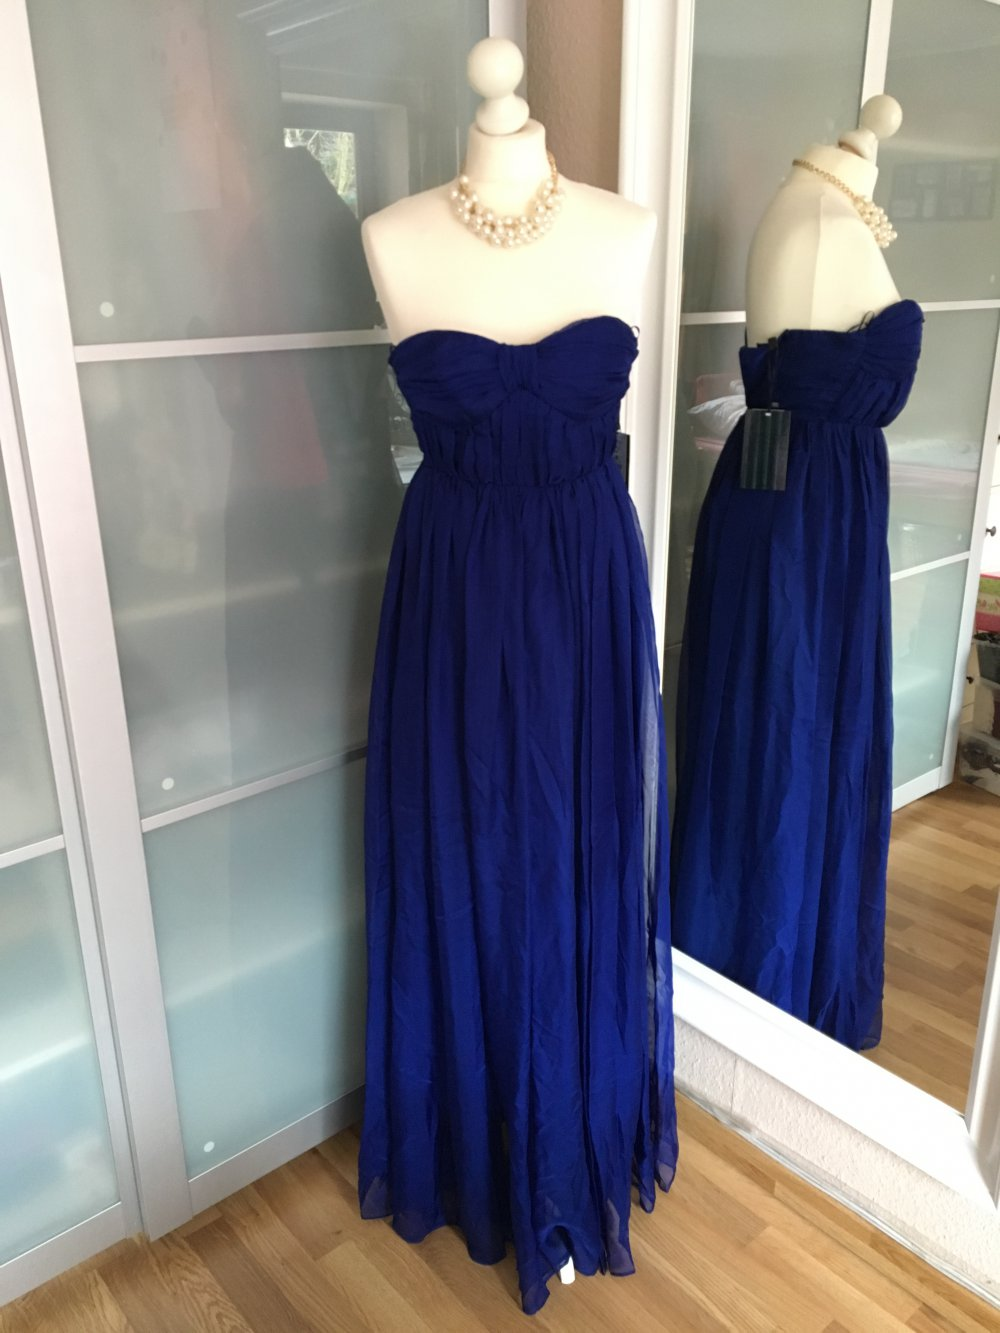 NEU Bershka Kleid Abendkleid Royalblau XS Abiballkleid Abschluss